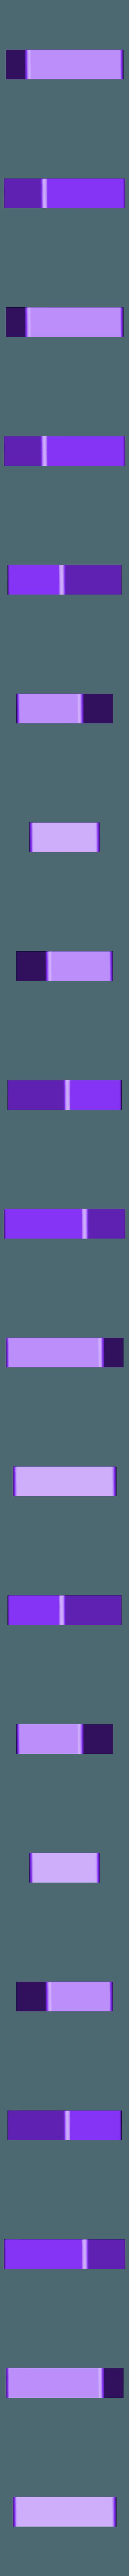 3-set-NMBR9 Insert.STL Download free STL file NMBR9 Box Insert • 3D print template, nickgrawburg